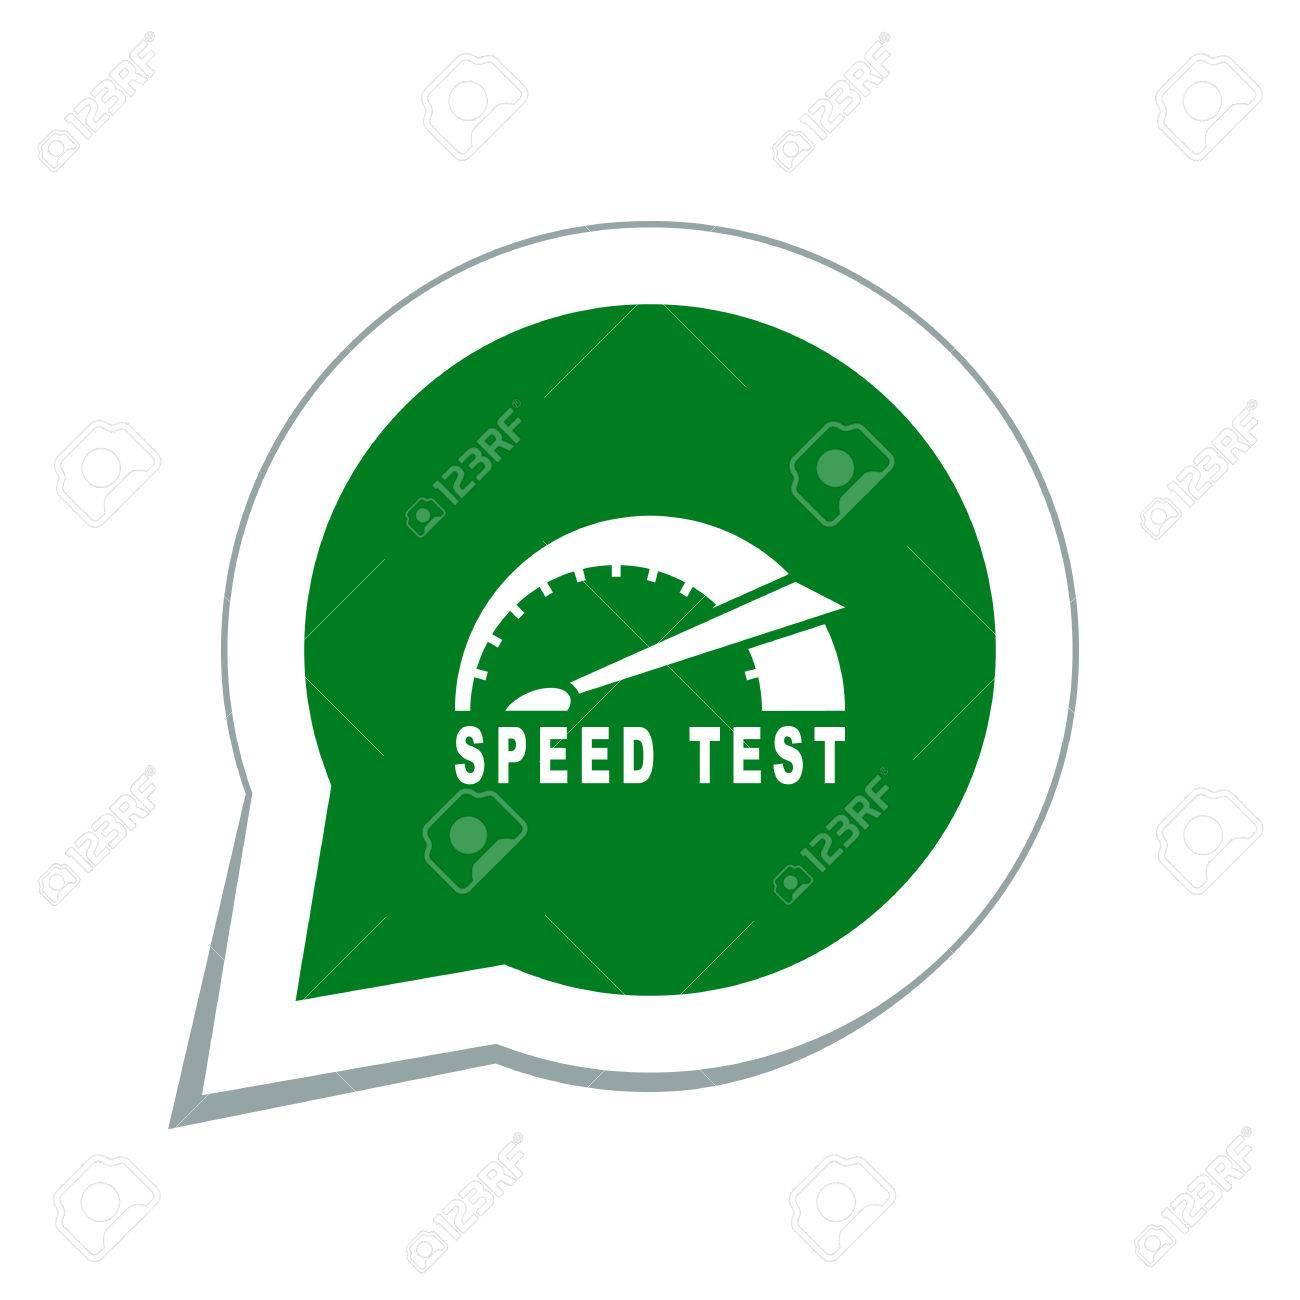 speed test icon - 45161731